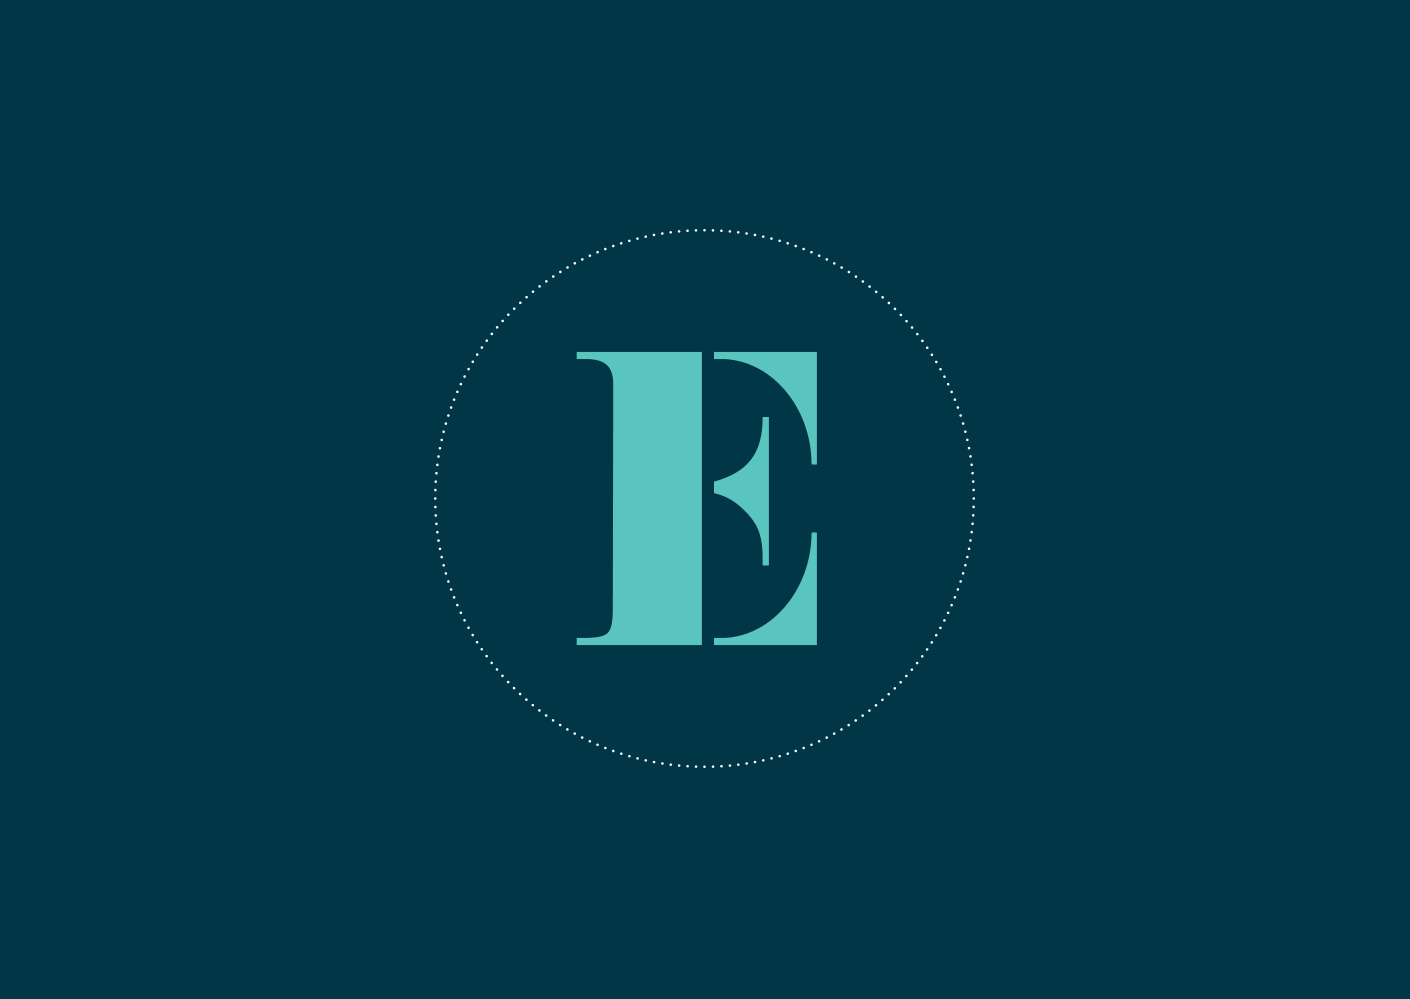 Elevation™ - strategic brand design and rebranding for growing organisations